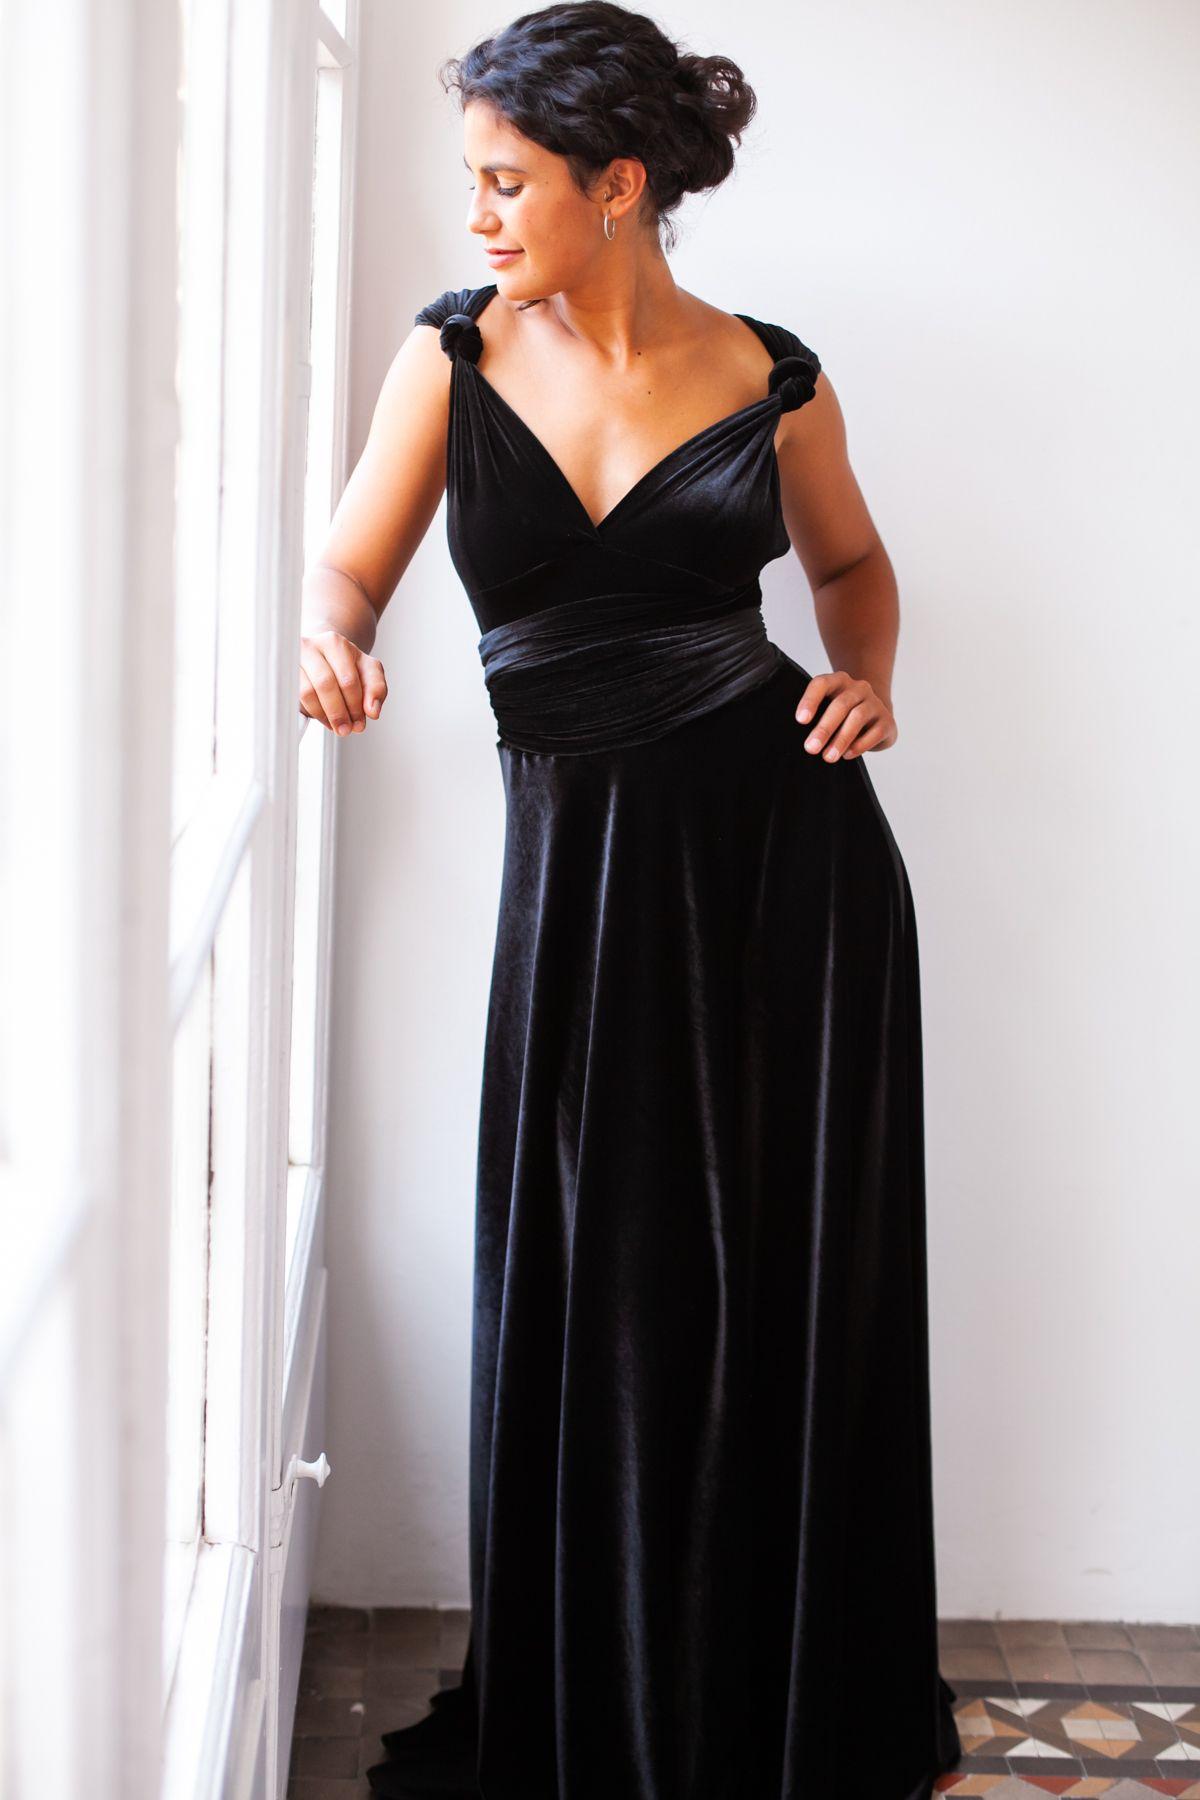 Black Velvet Dress Infinity Dress For Special Events Elegant Multiposition Dress Black Bridesmaid Dresses Long Black Velvet Dress Long Velvet Dress Long [ 1800 x 1200 Pixel ]